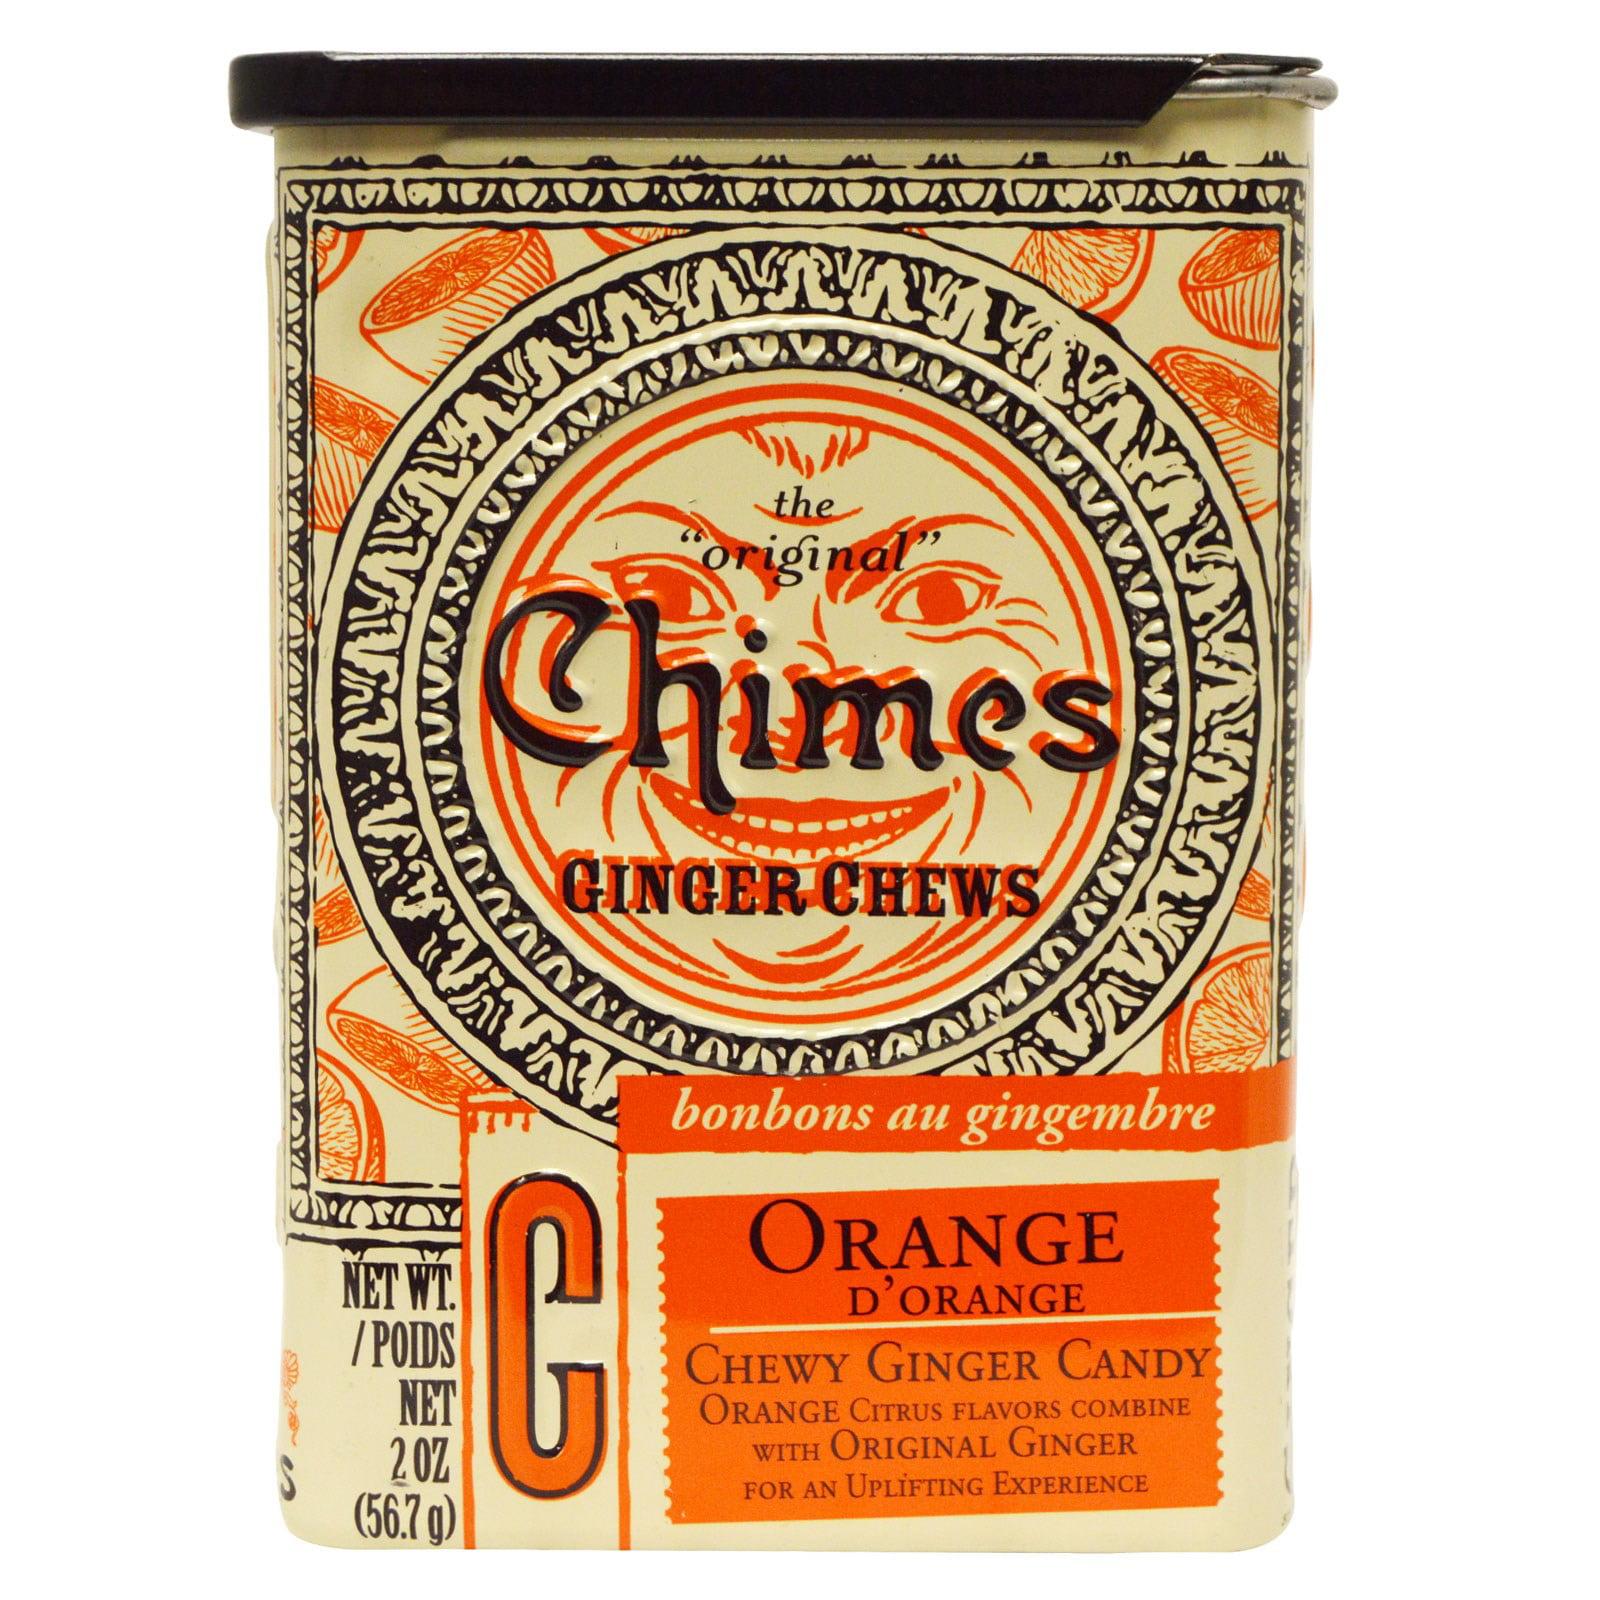 Chimes, Ginger Chews, Orange, 2 oz (pack of 4)